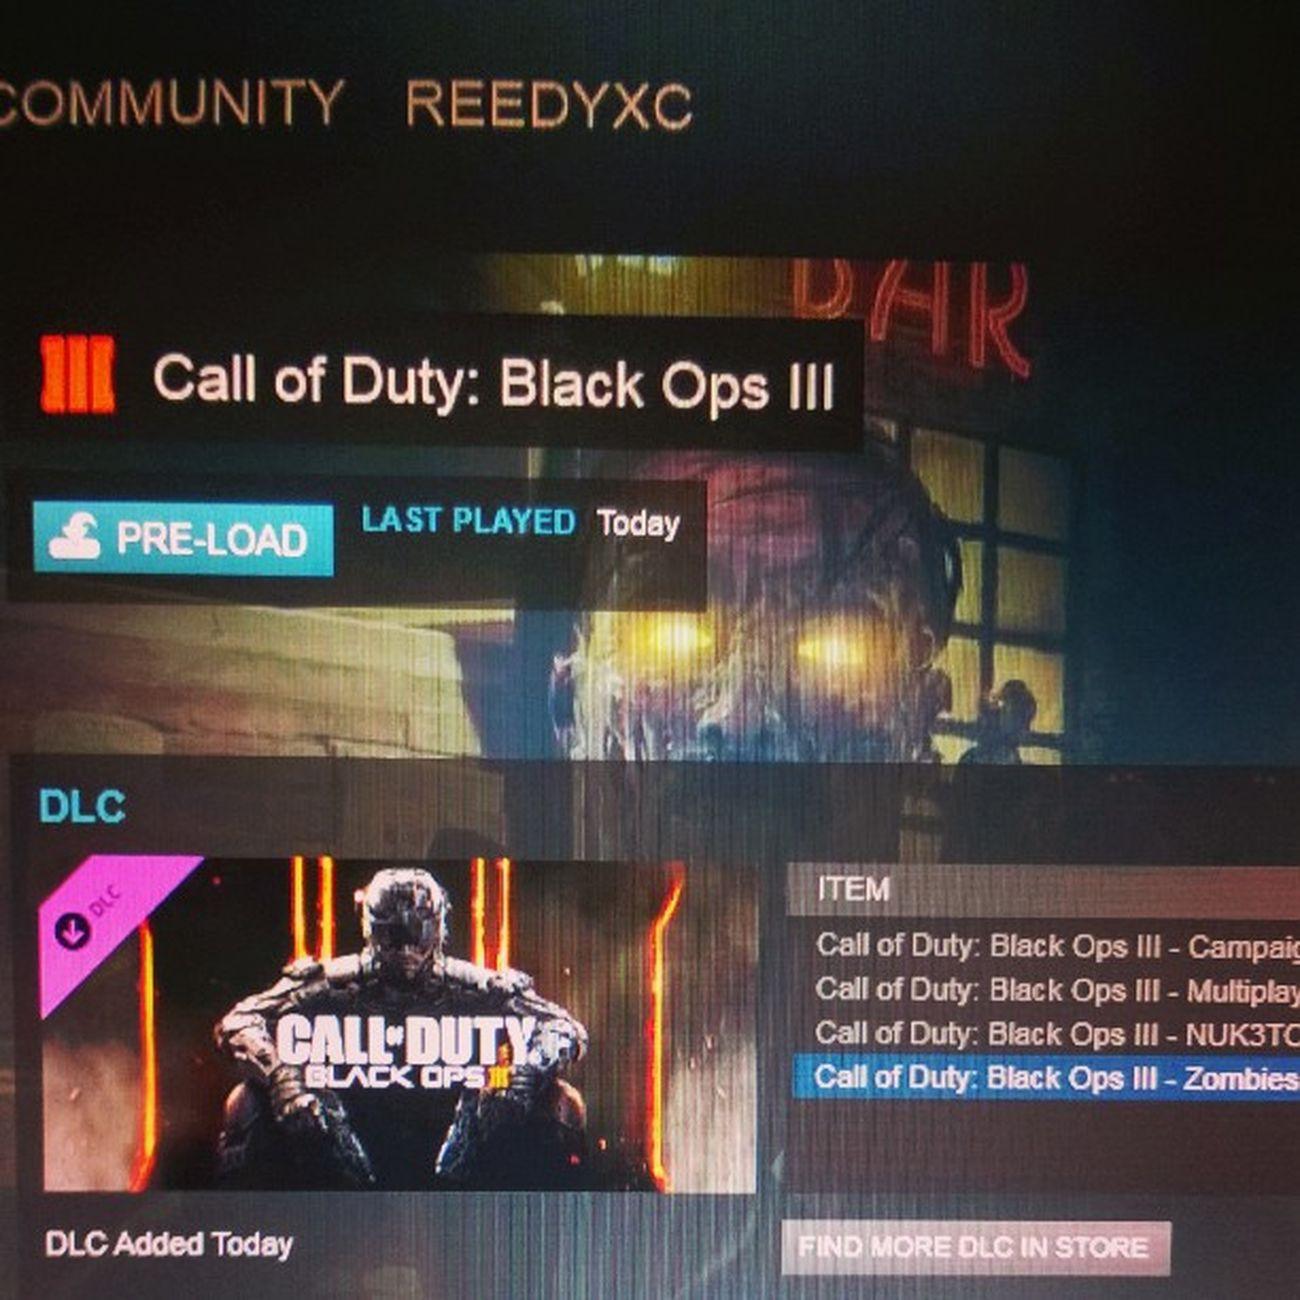 Blackops3 PC PreLoad! GRAB A COPY AT KINGUIN.NET/R/REEDY FOR £27!! PCGaming Pcmasterrace CallOfDuty COD Gaming